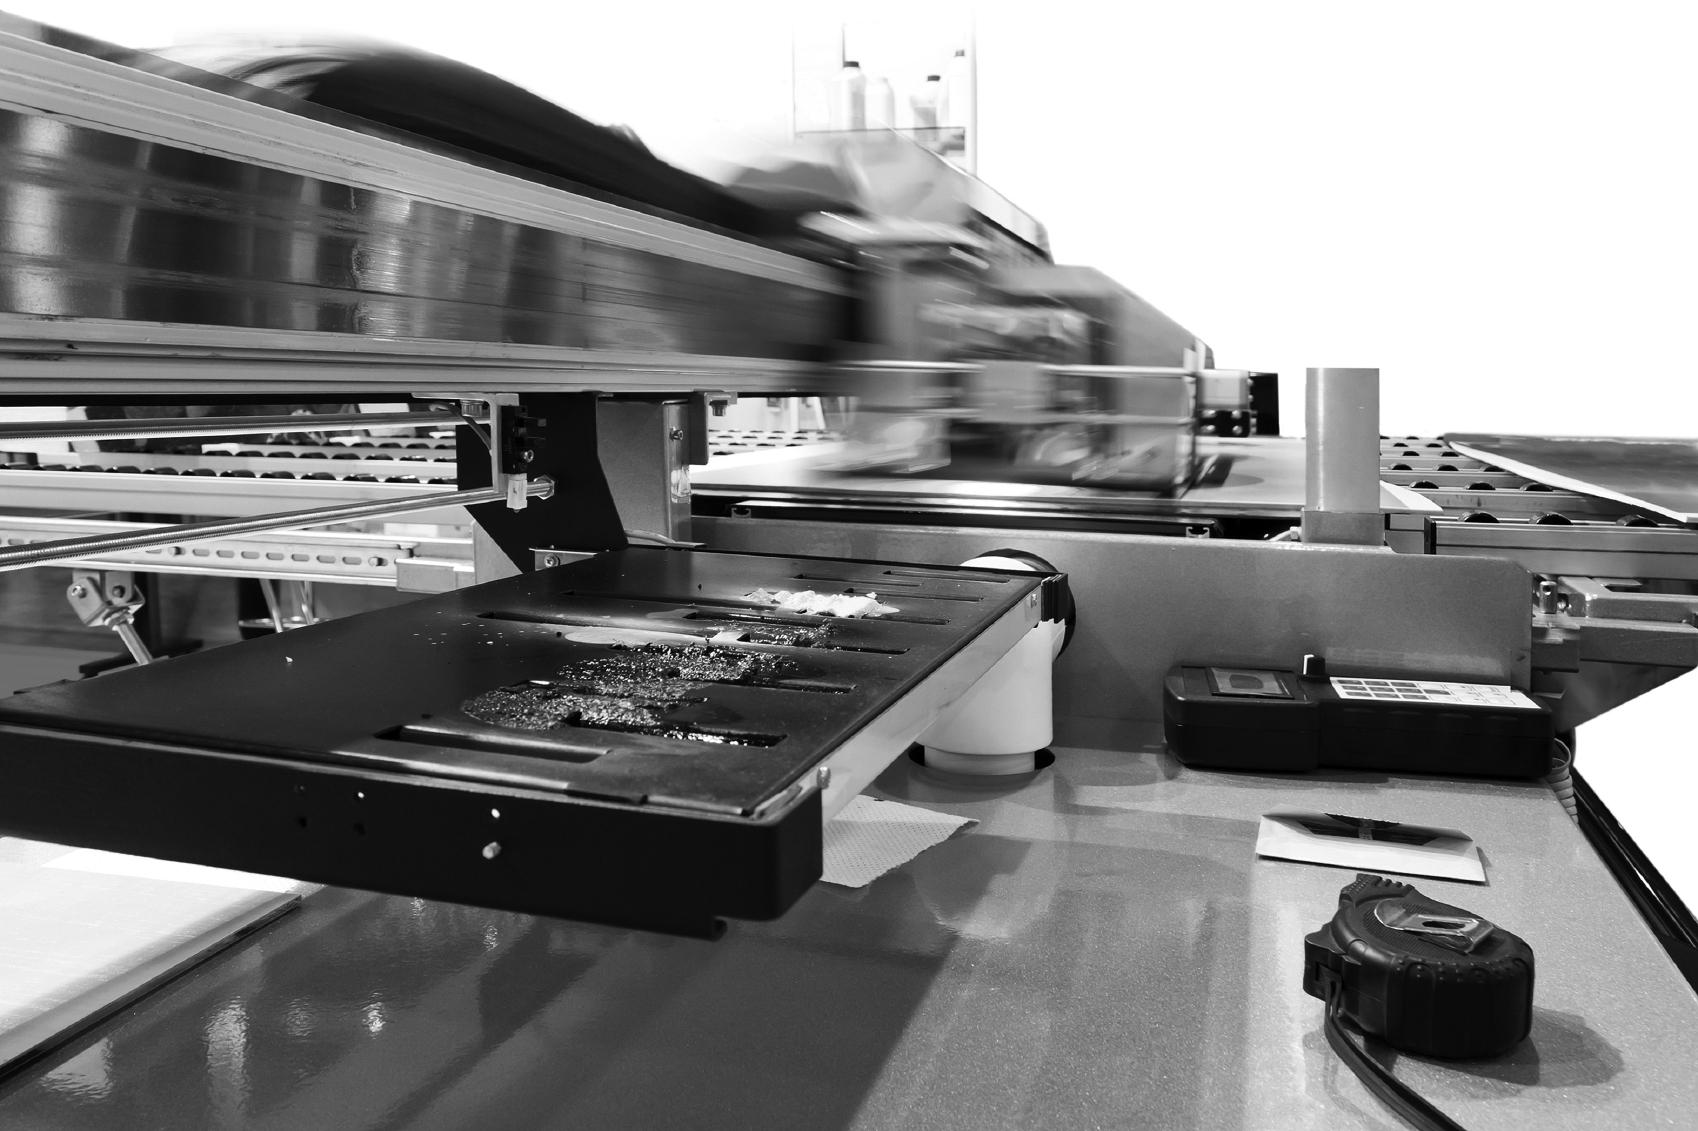 printing service cannes, monaco & nice